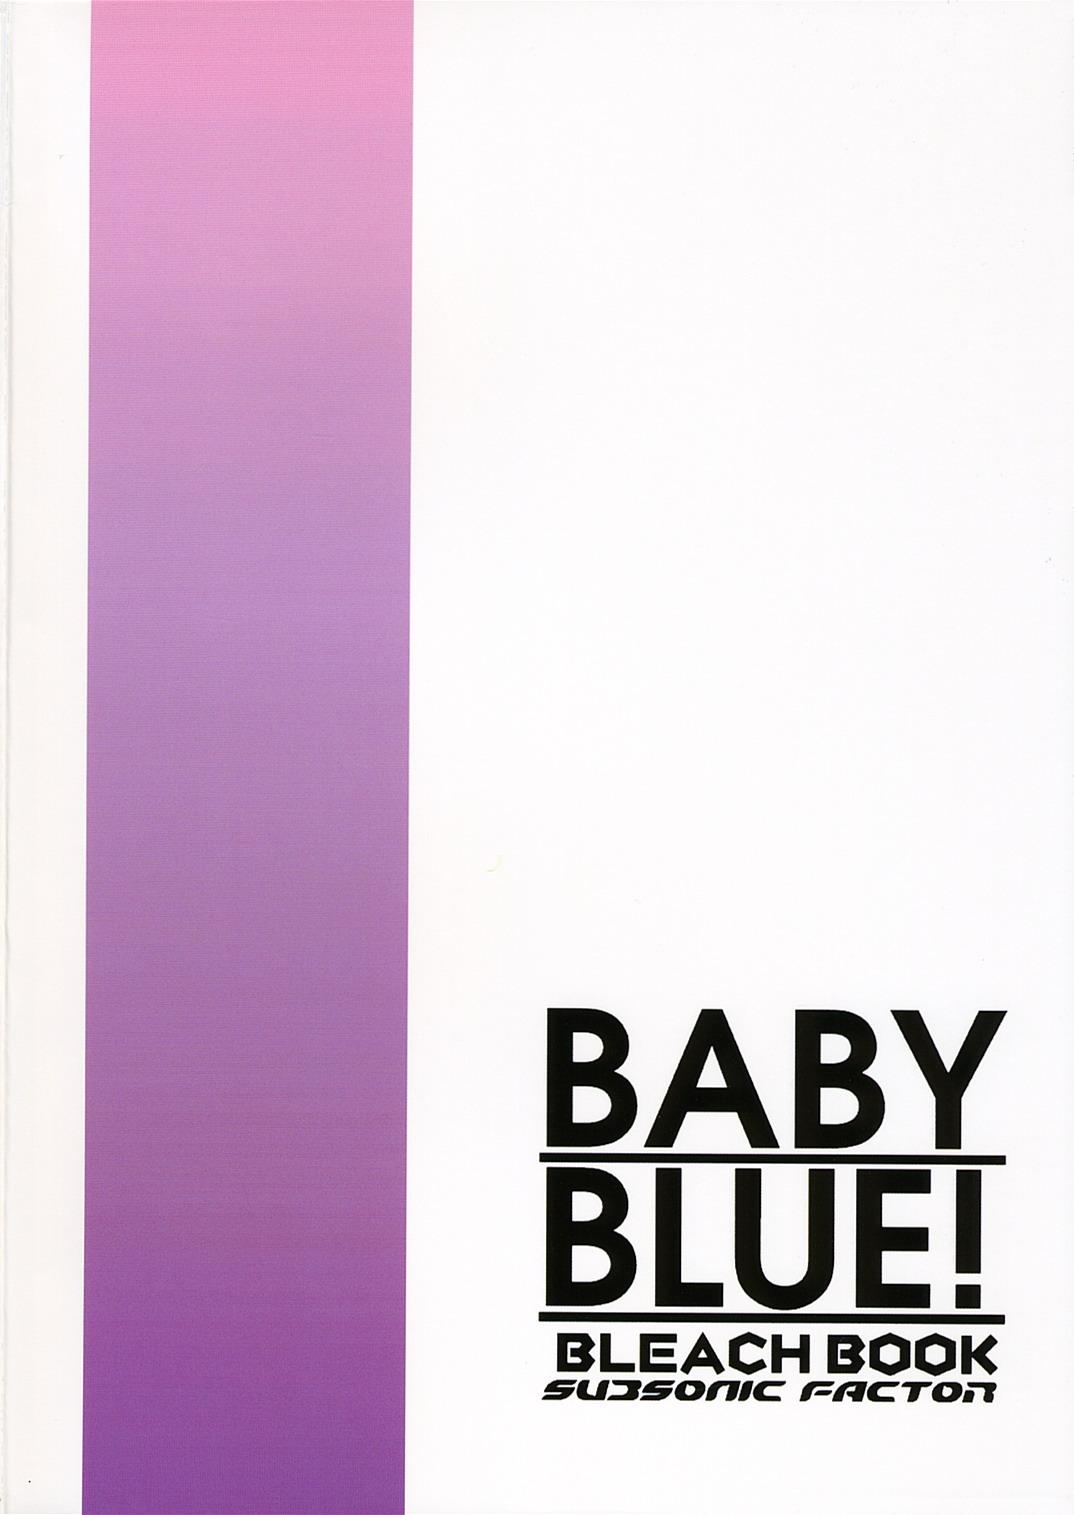 BABY BLUE! 33